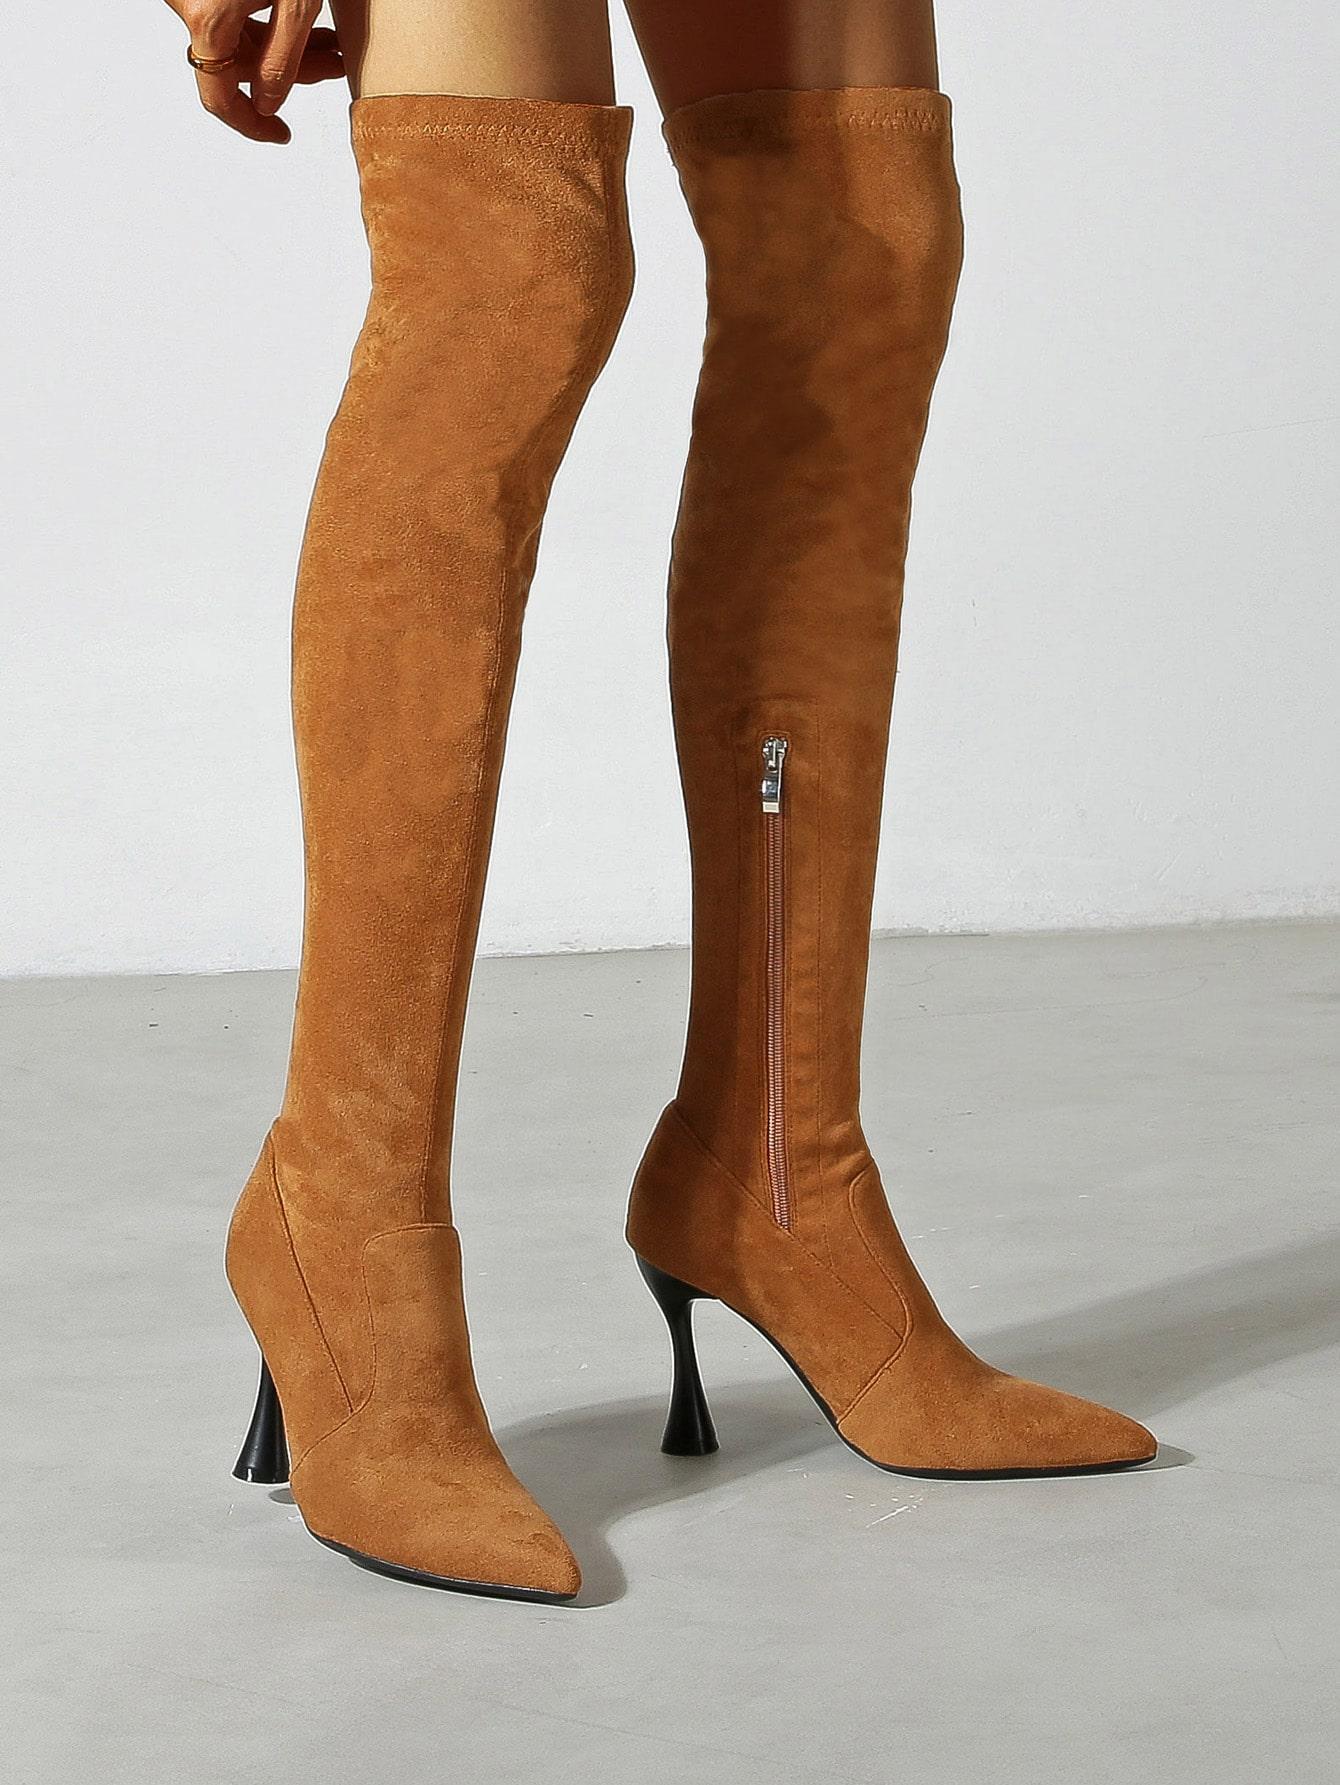 Suede Side Zipper Stiletto Heeled Point Toe Sock Boots